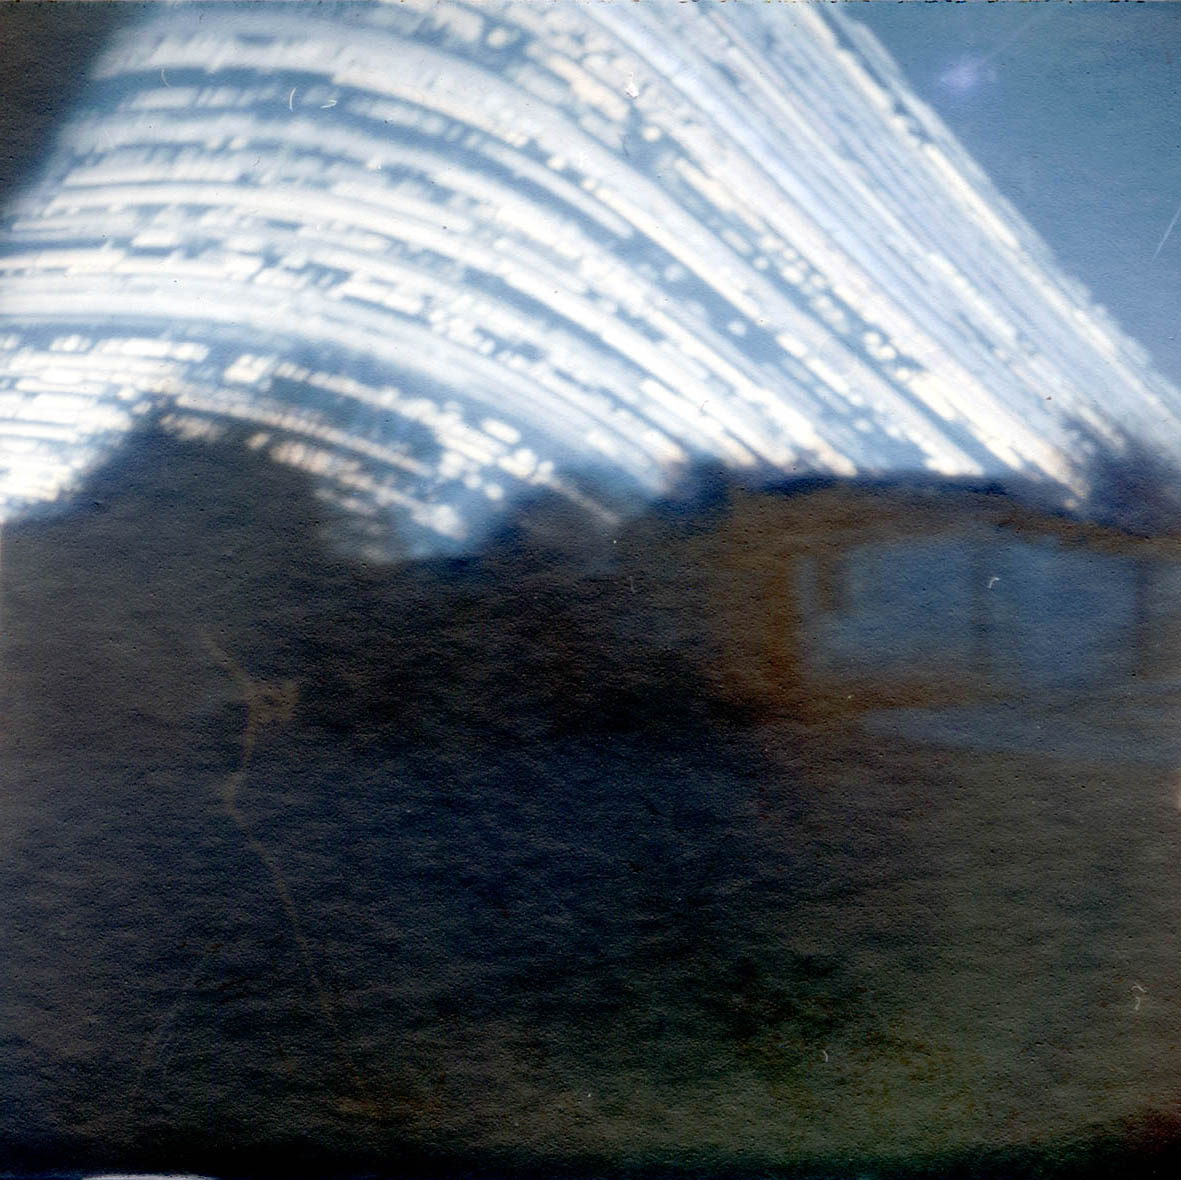 Solargraph 2 (Simon Anderson) web